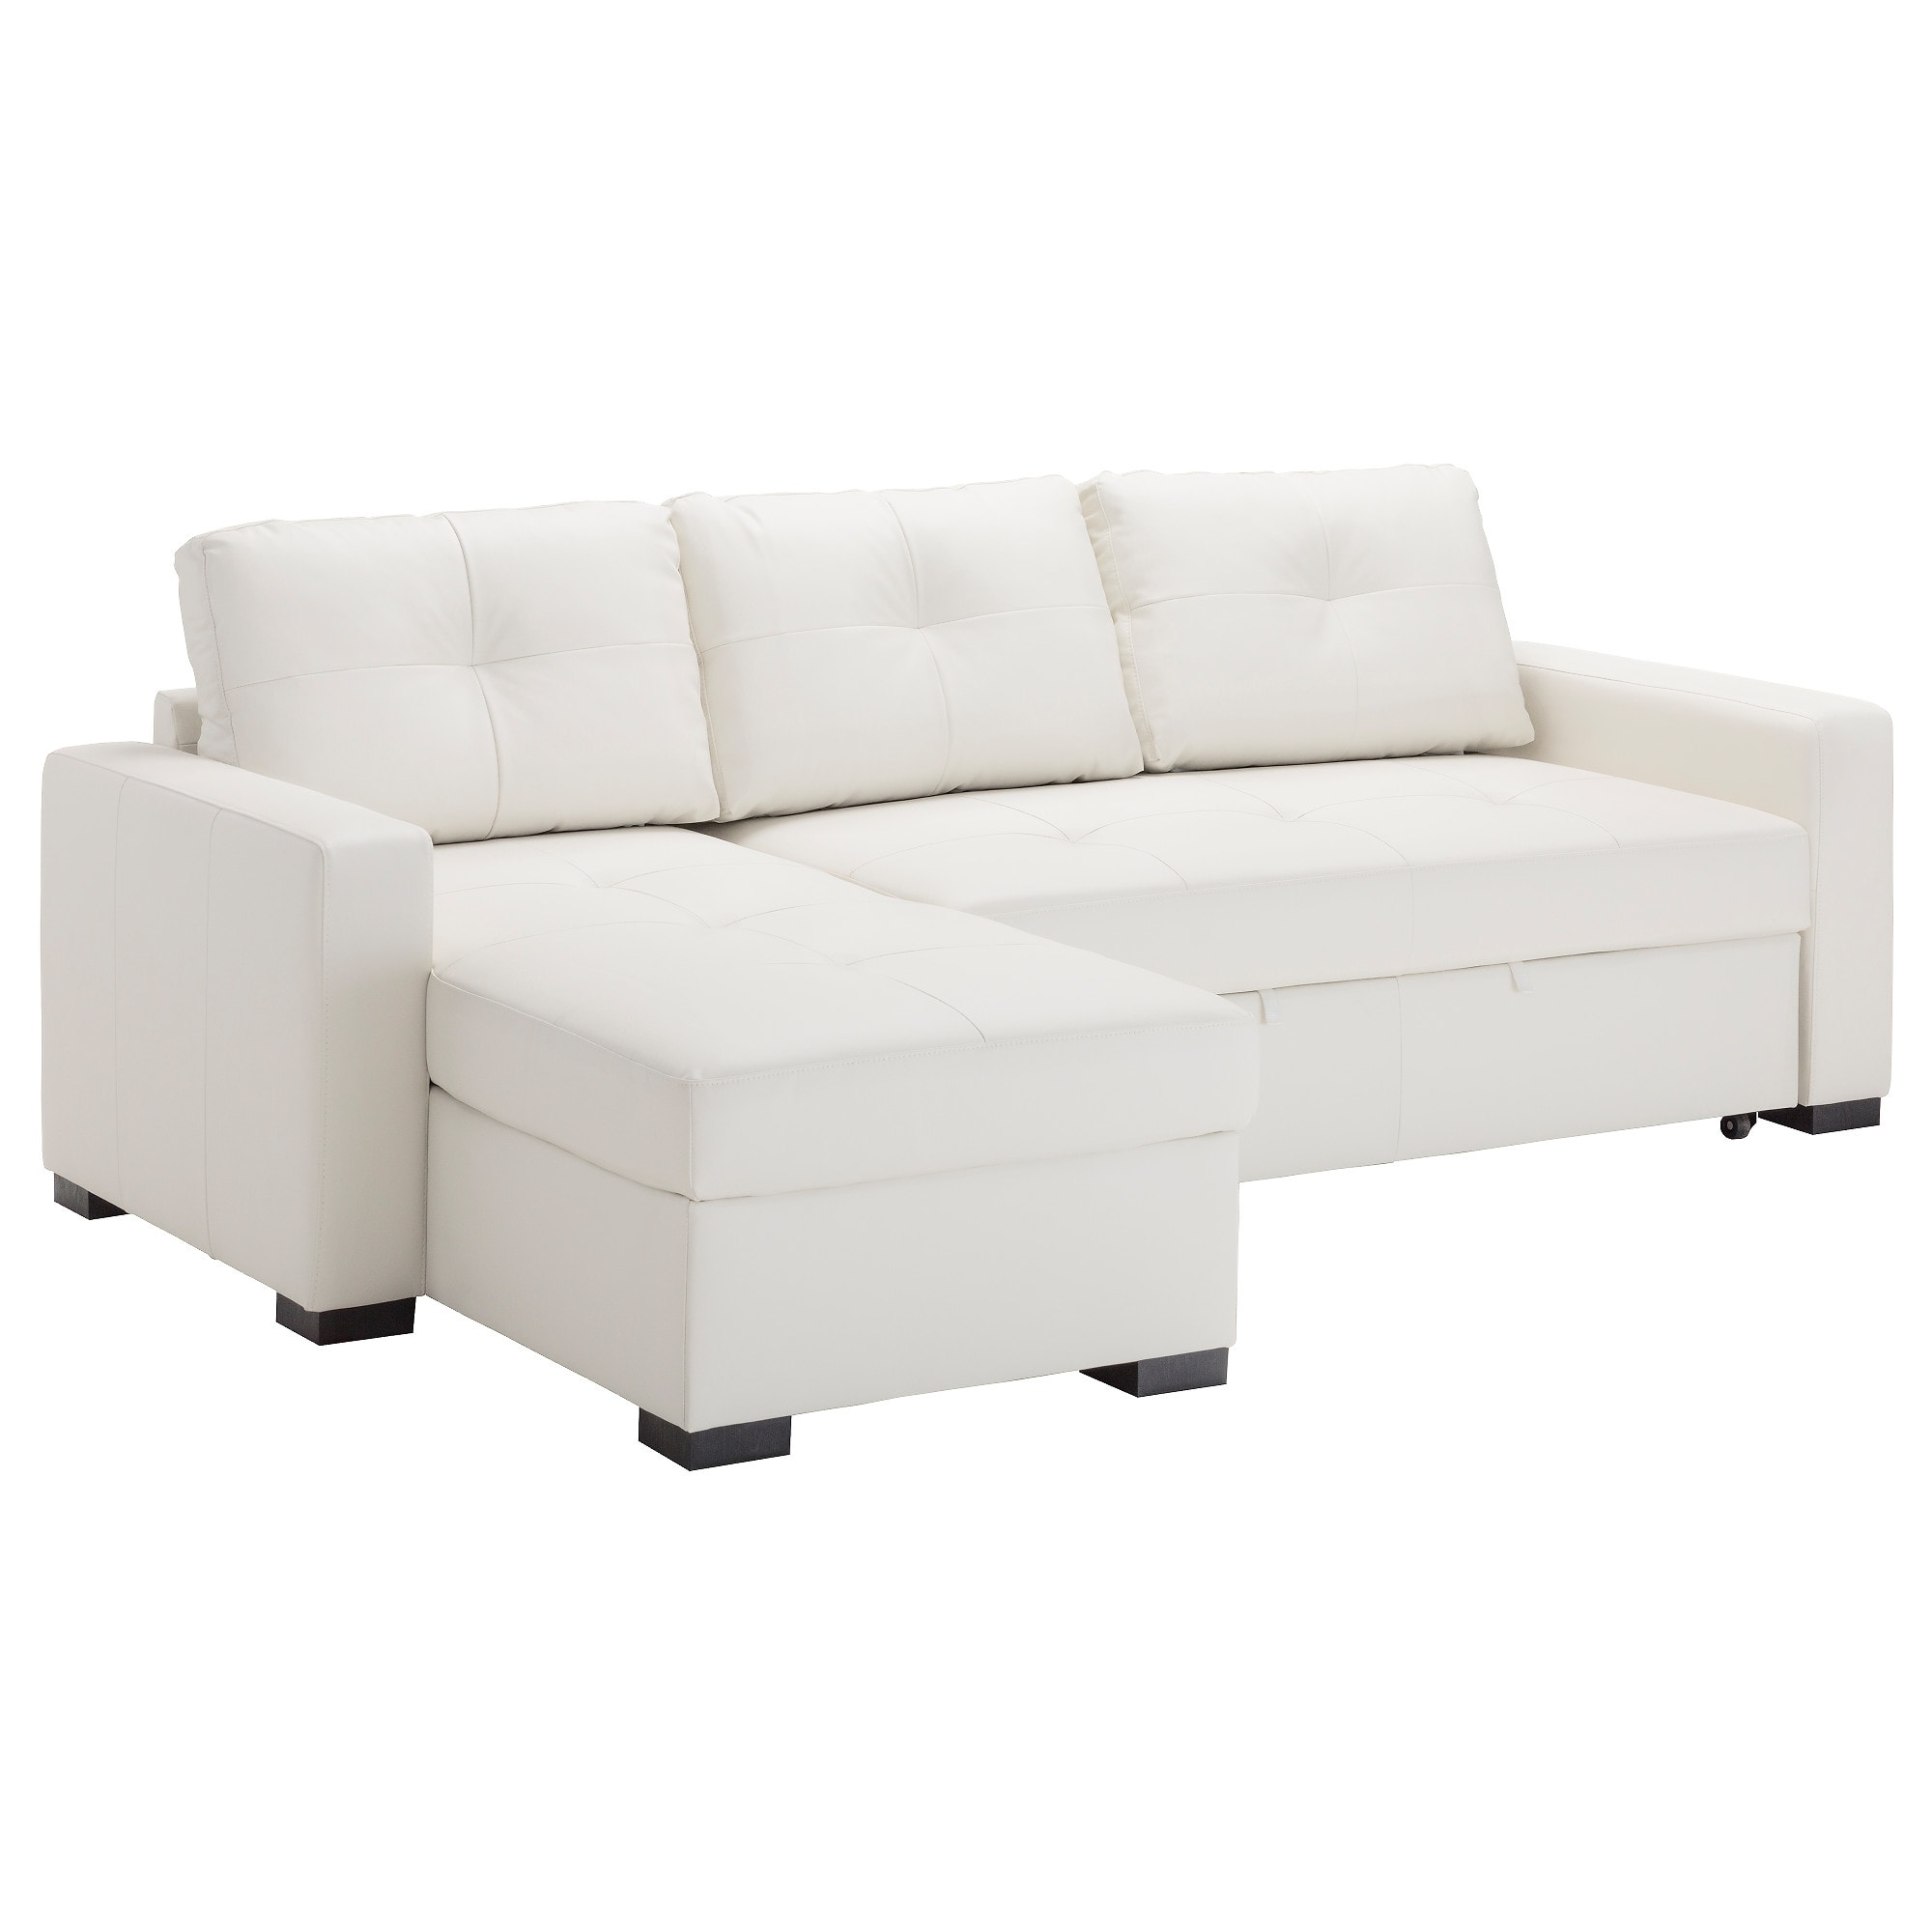 Sofas Cama Ikea 2017 Y7du sofà S Cama De Calidad Pra Online Ikea